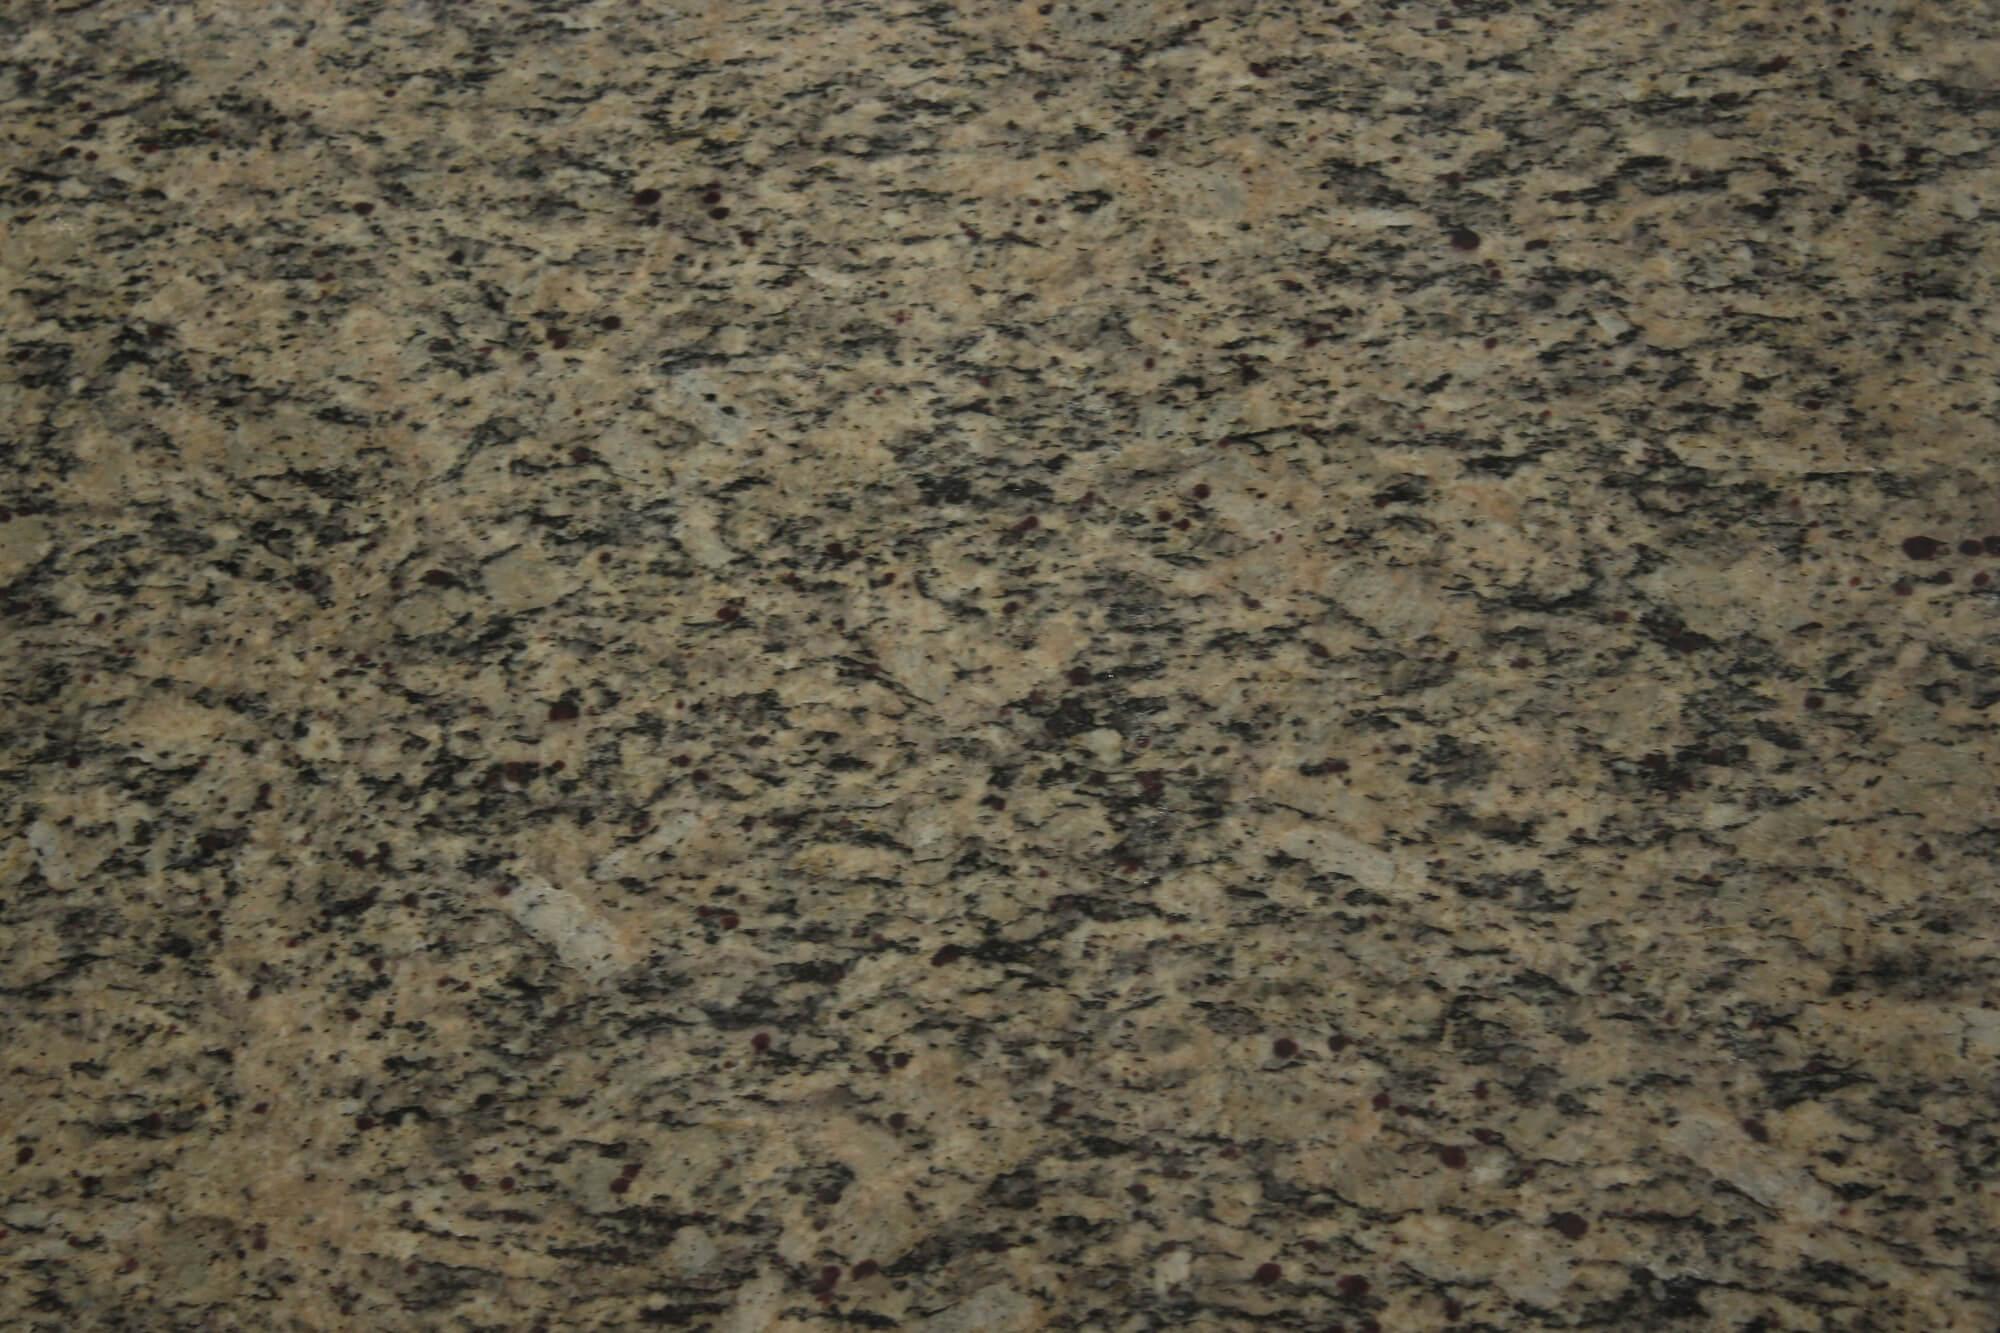 SANTA CECILIA LIGHT фото 1 — камень от Bevers Marmyr